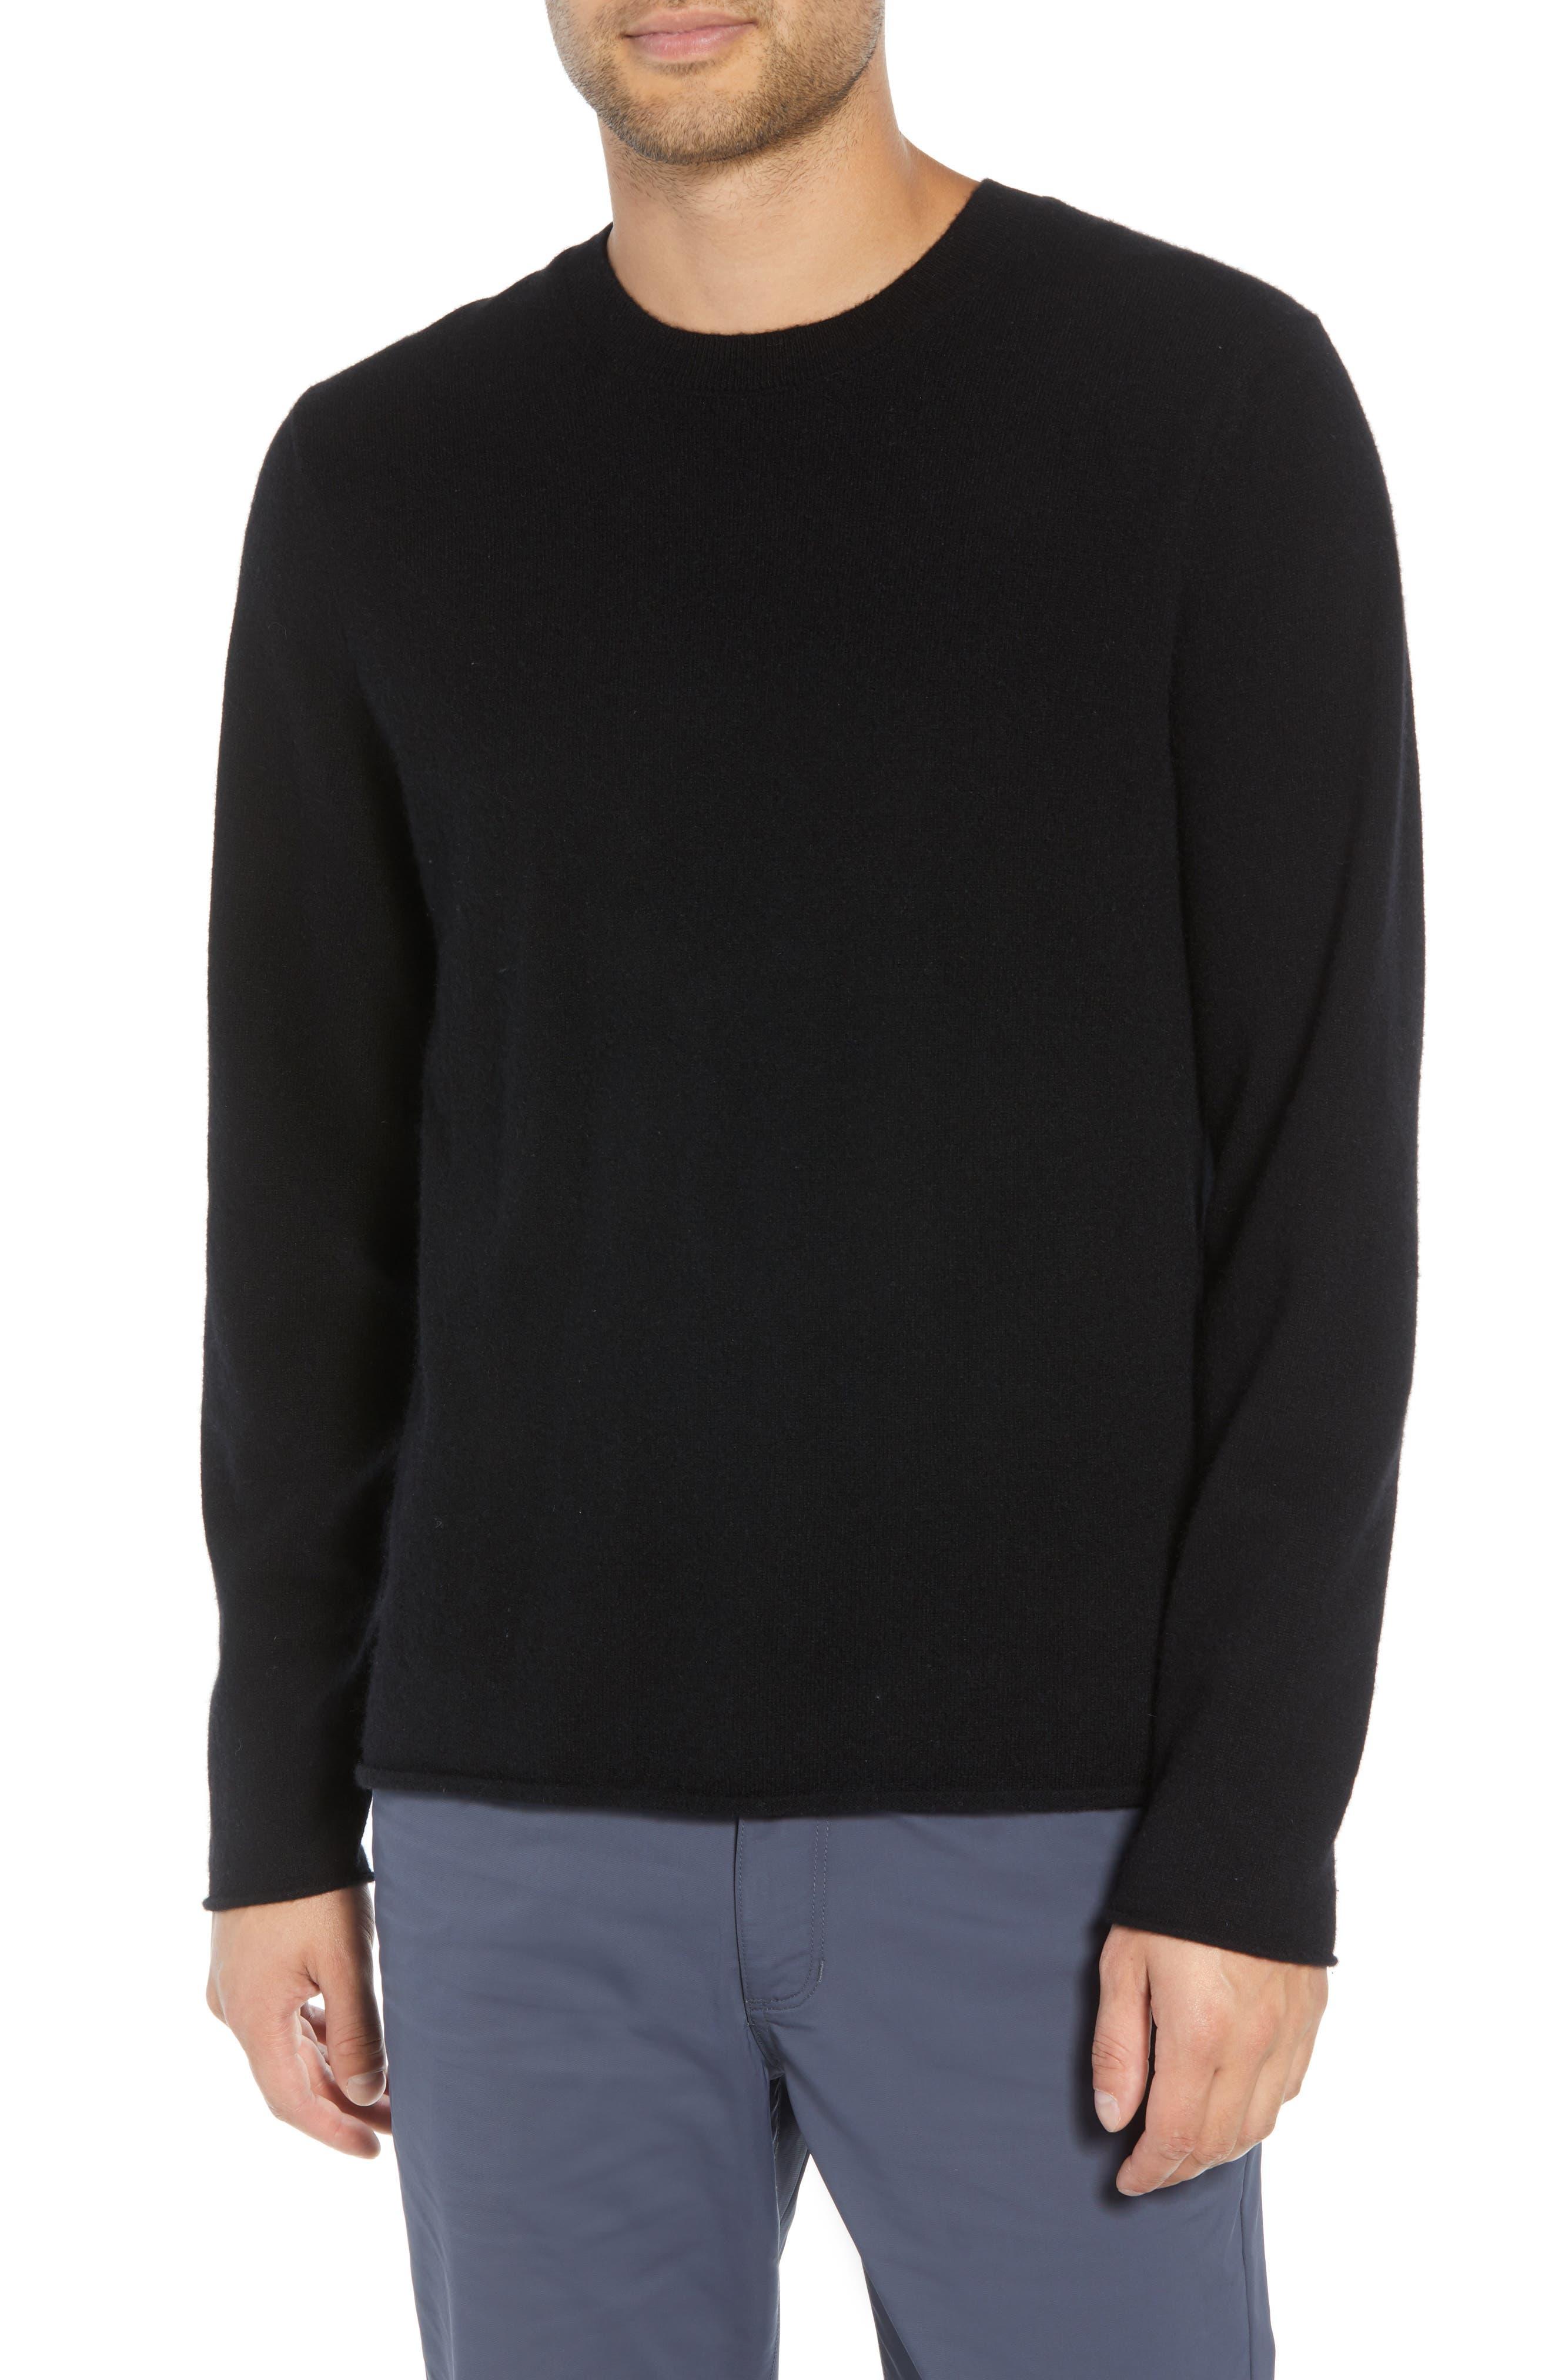 Regular Fit Cashmere Sweater,                             Main thumbnail 1, color,                             BLACK